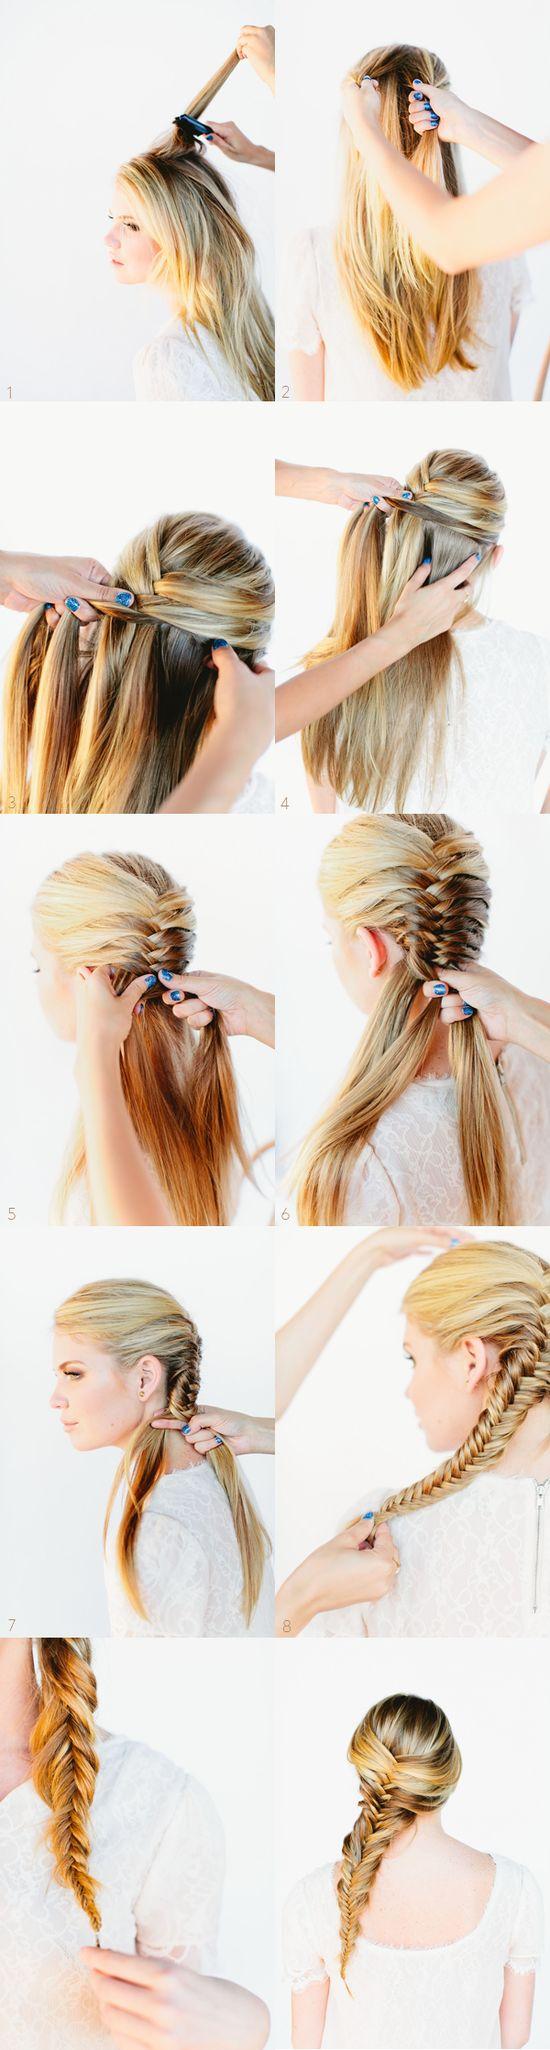 {DIY Fishtail Braid Hair Tutorial}